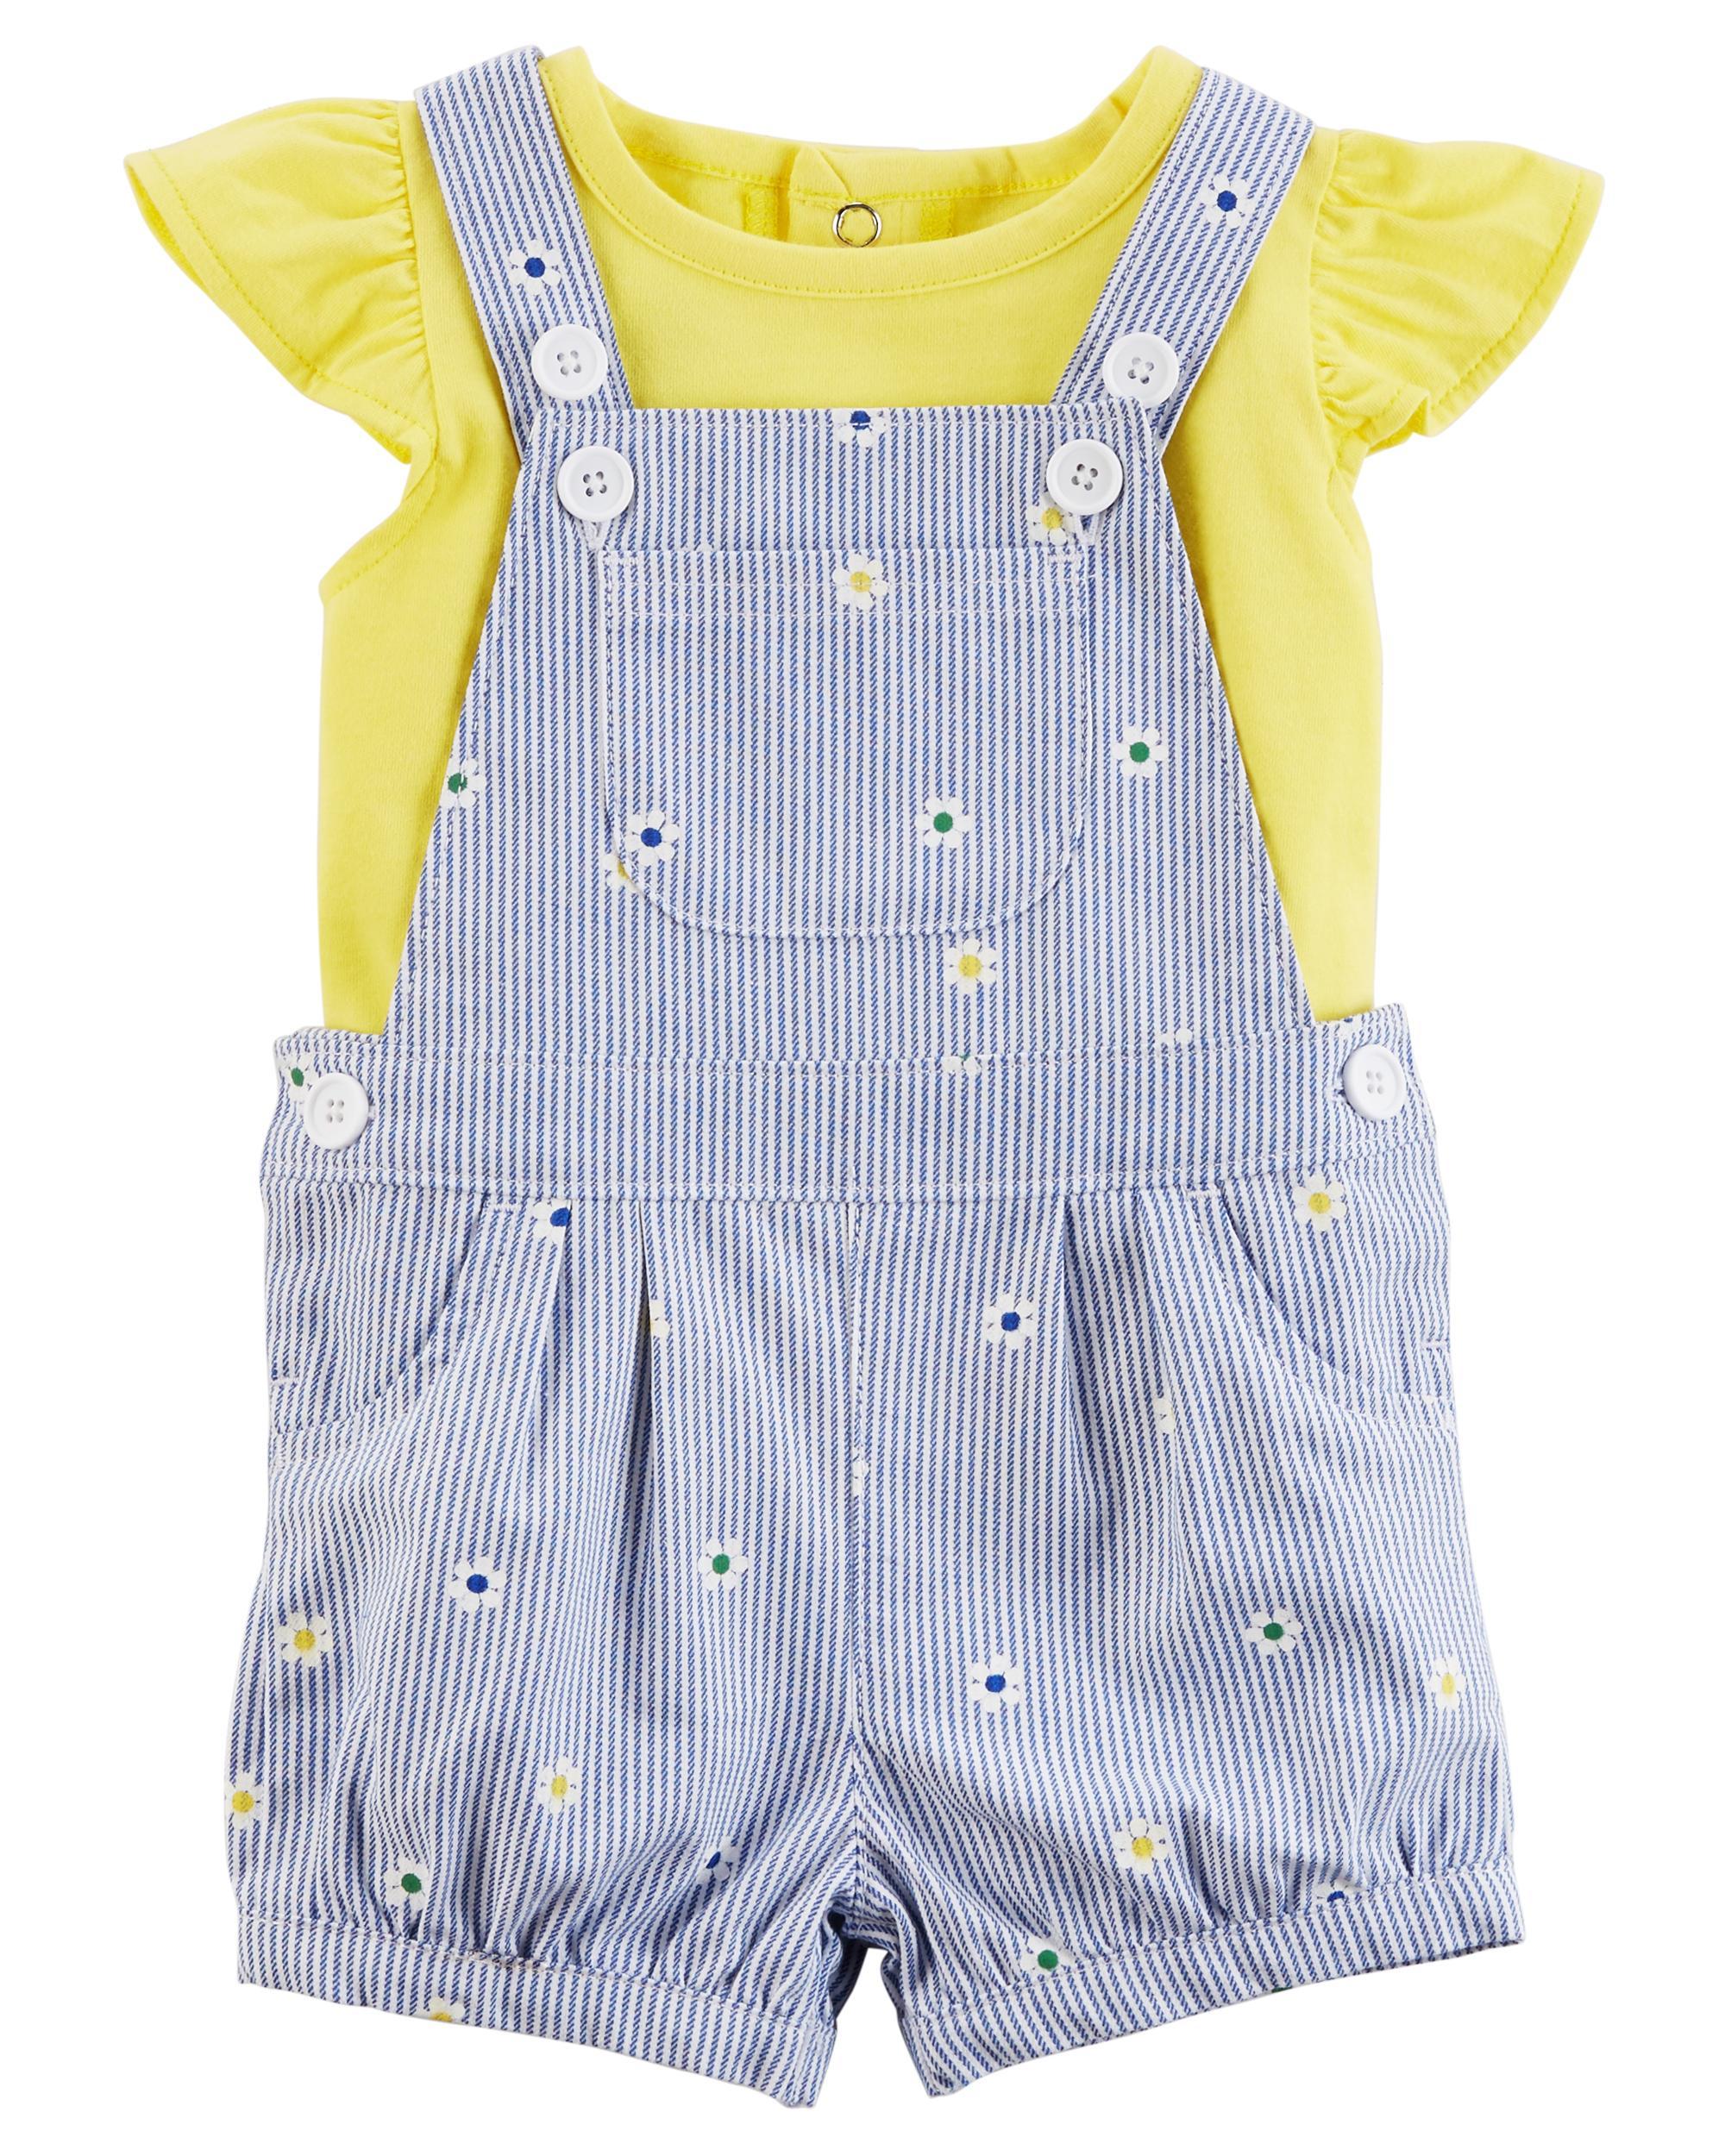 Carters Baby Girls 2-Piece Top /& Shortalls Set Super Sweet